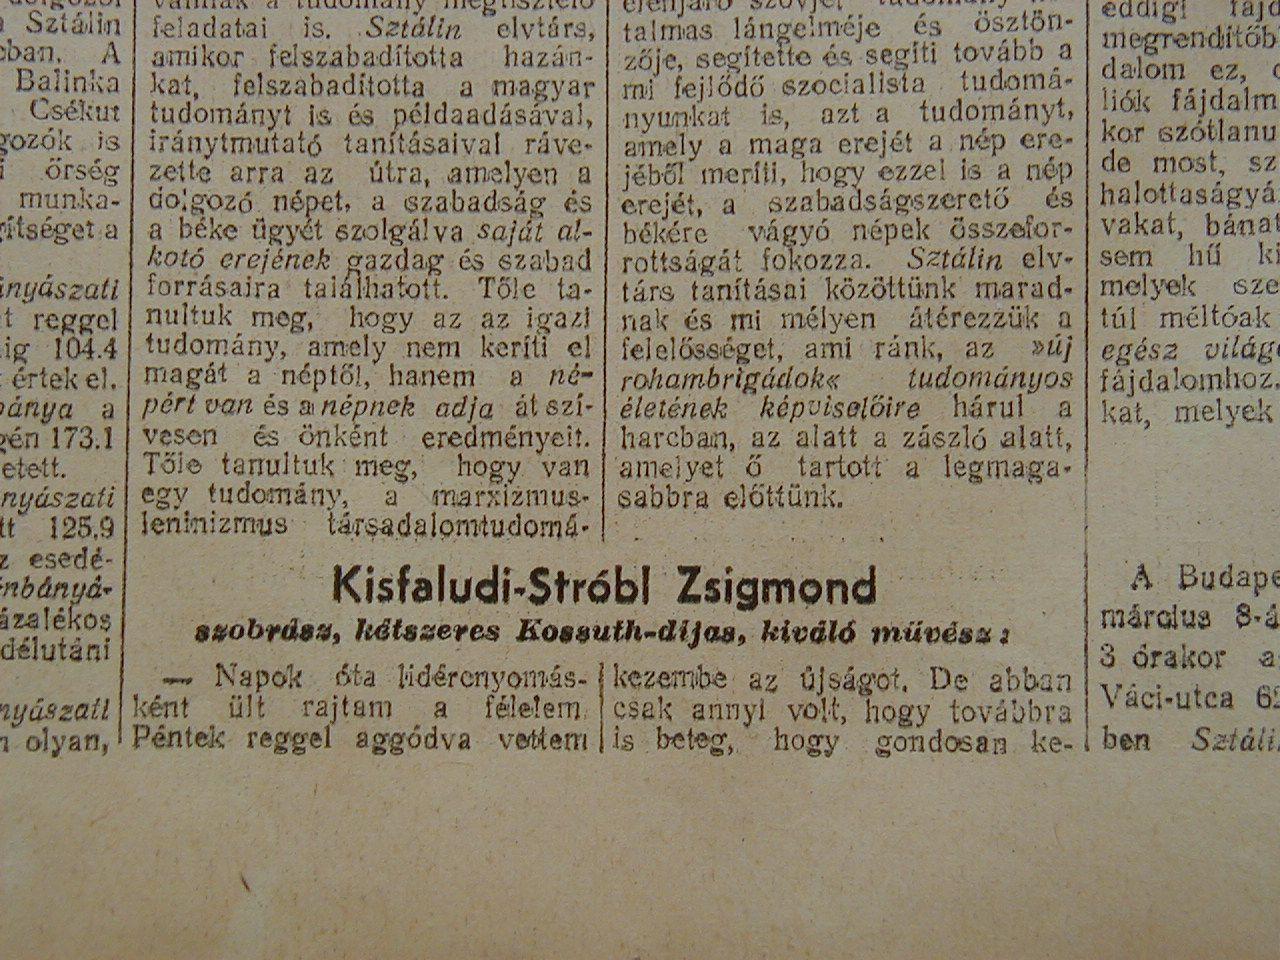 1953-MagyarNemzet-035.jpg